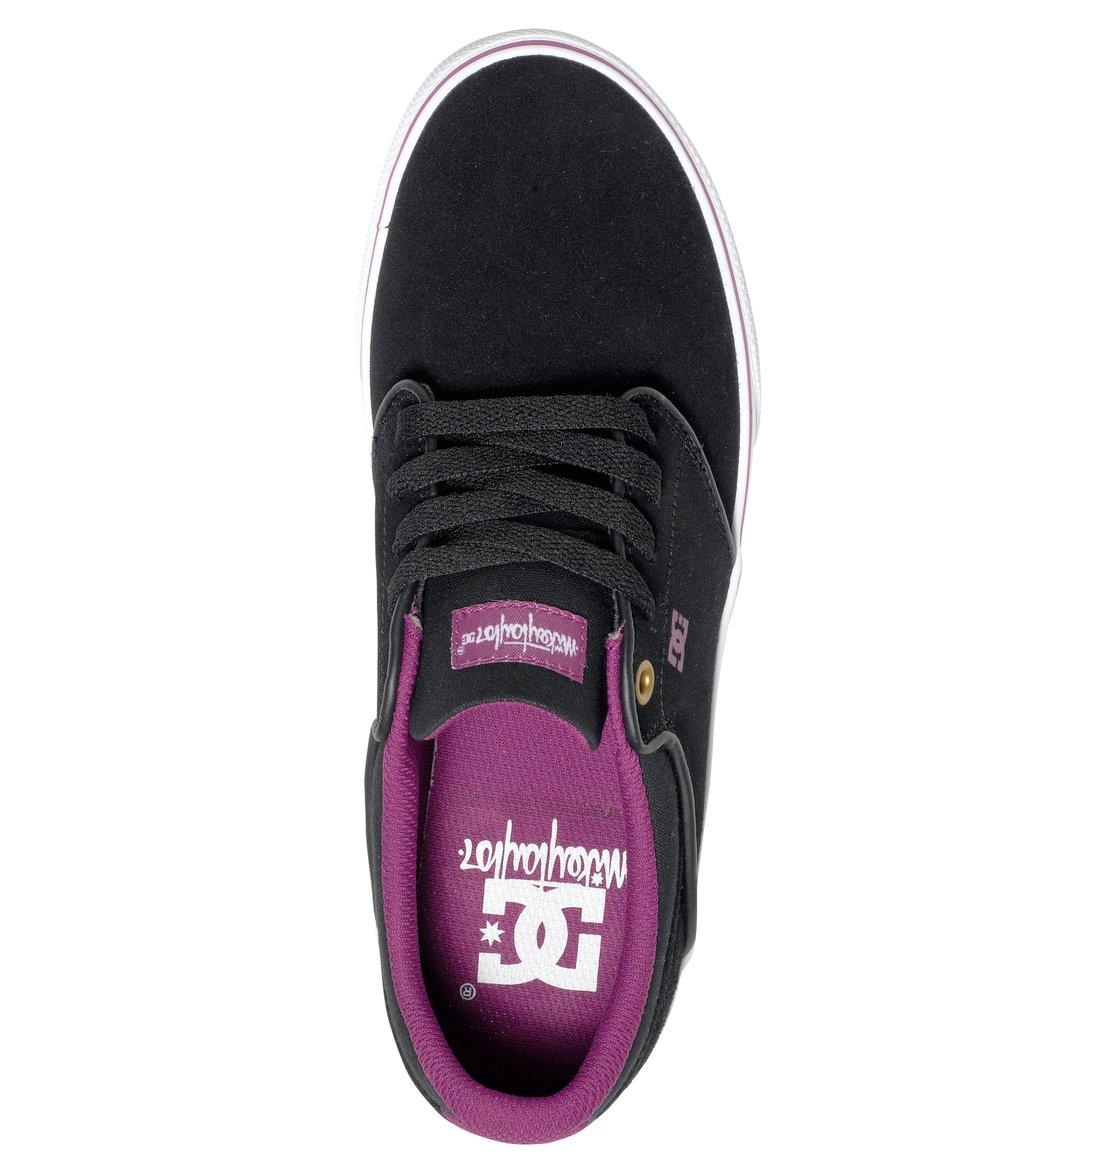 Basses Vulc Mikey Adjs300094Dc Taylor Shoes Chaussures hQxsrtdBC